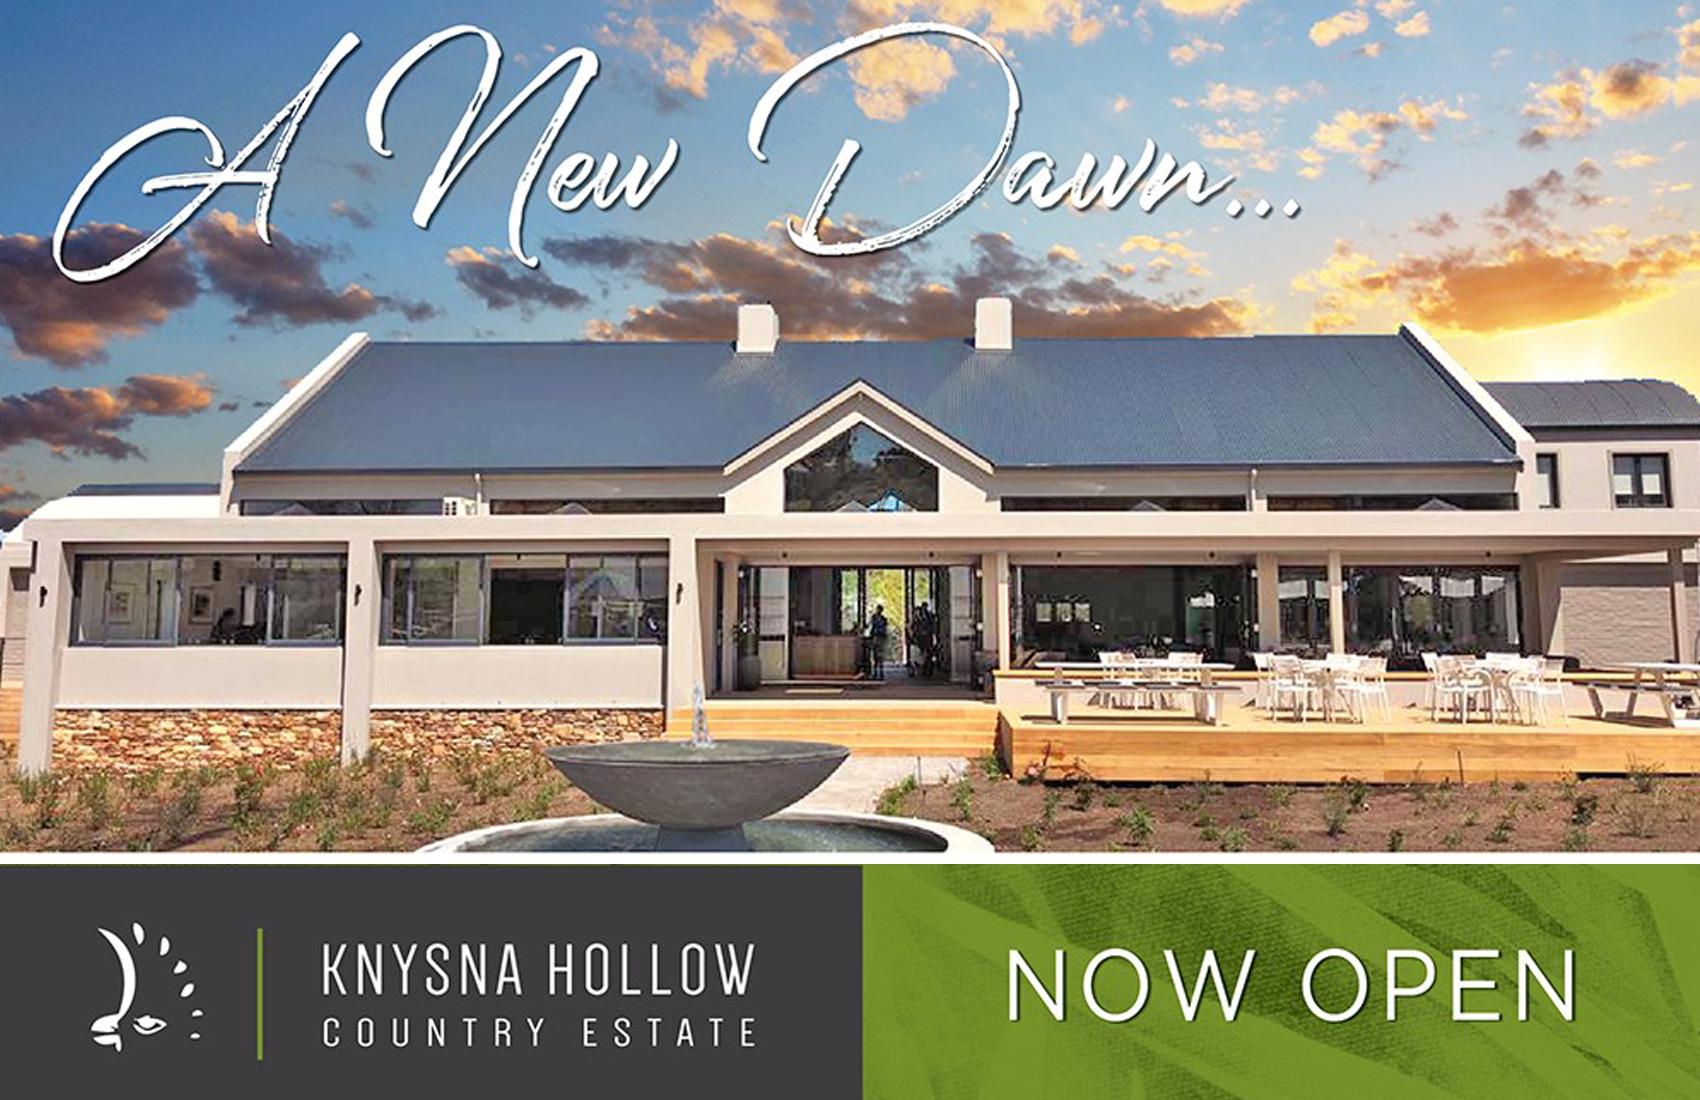 Knysna_Hollow_Now_Open